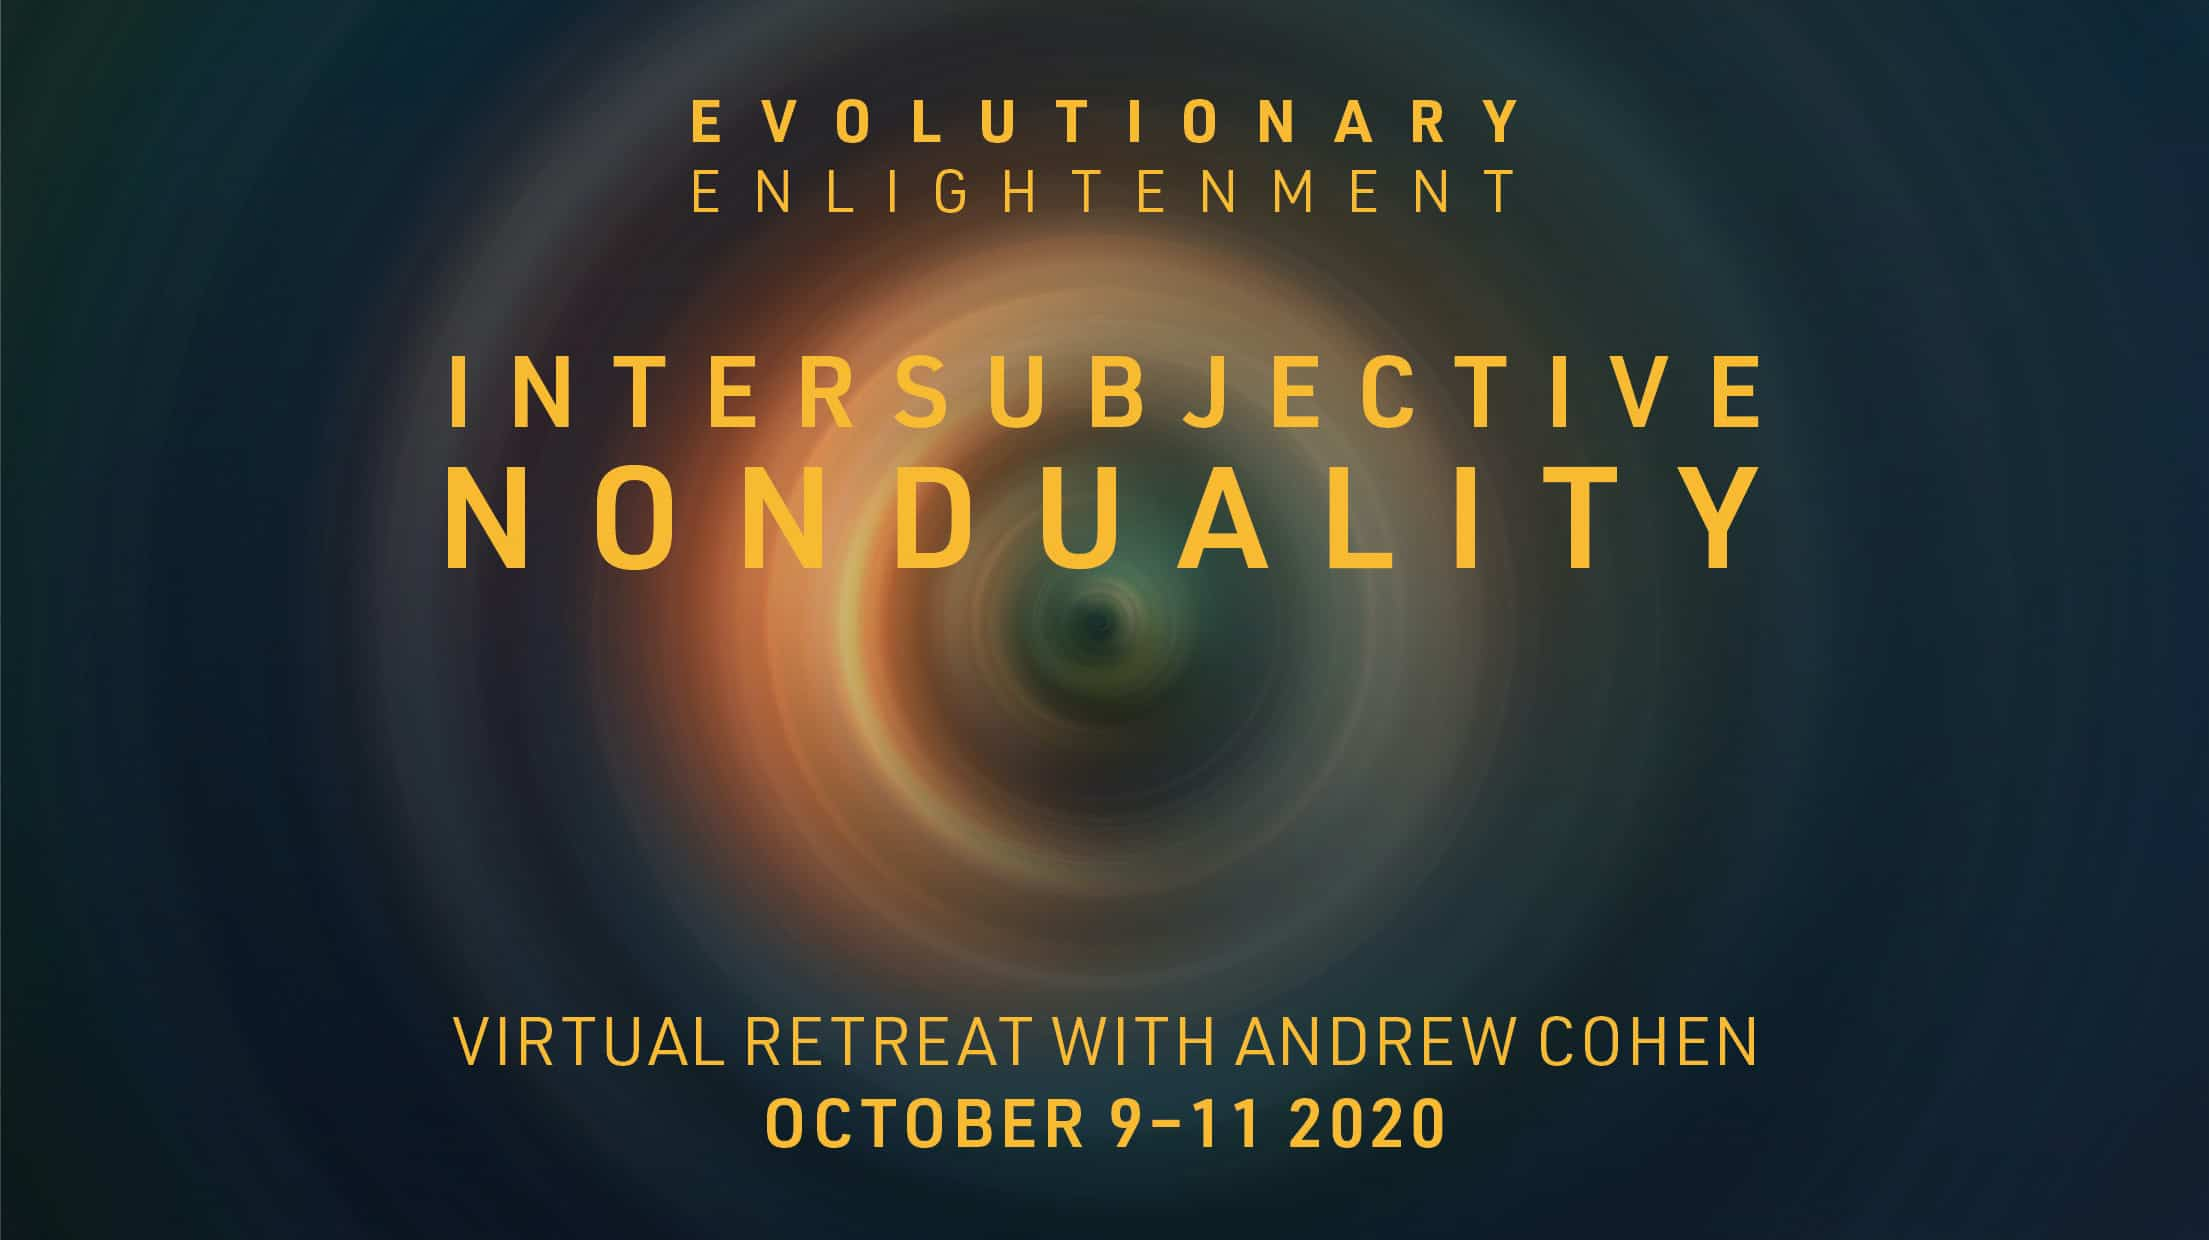 Intersubjective Nonduality